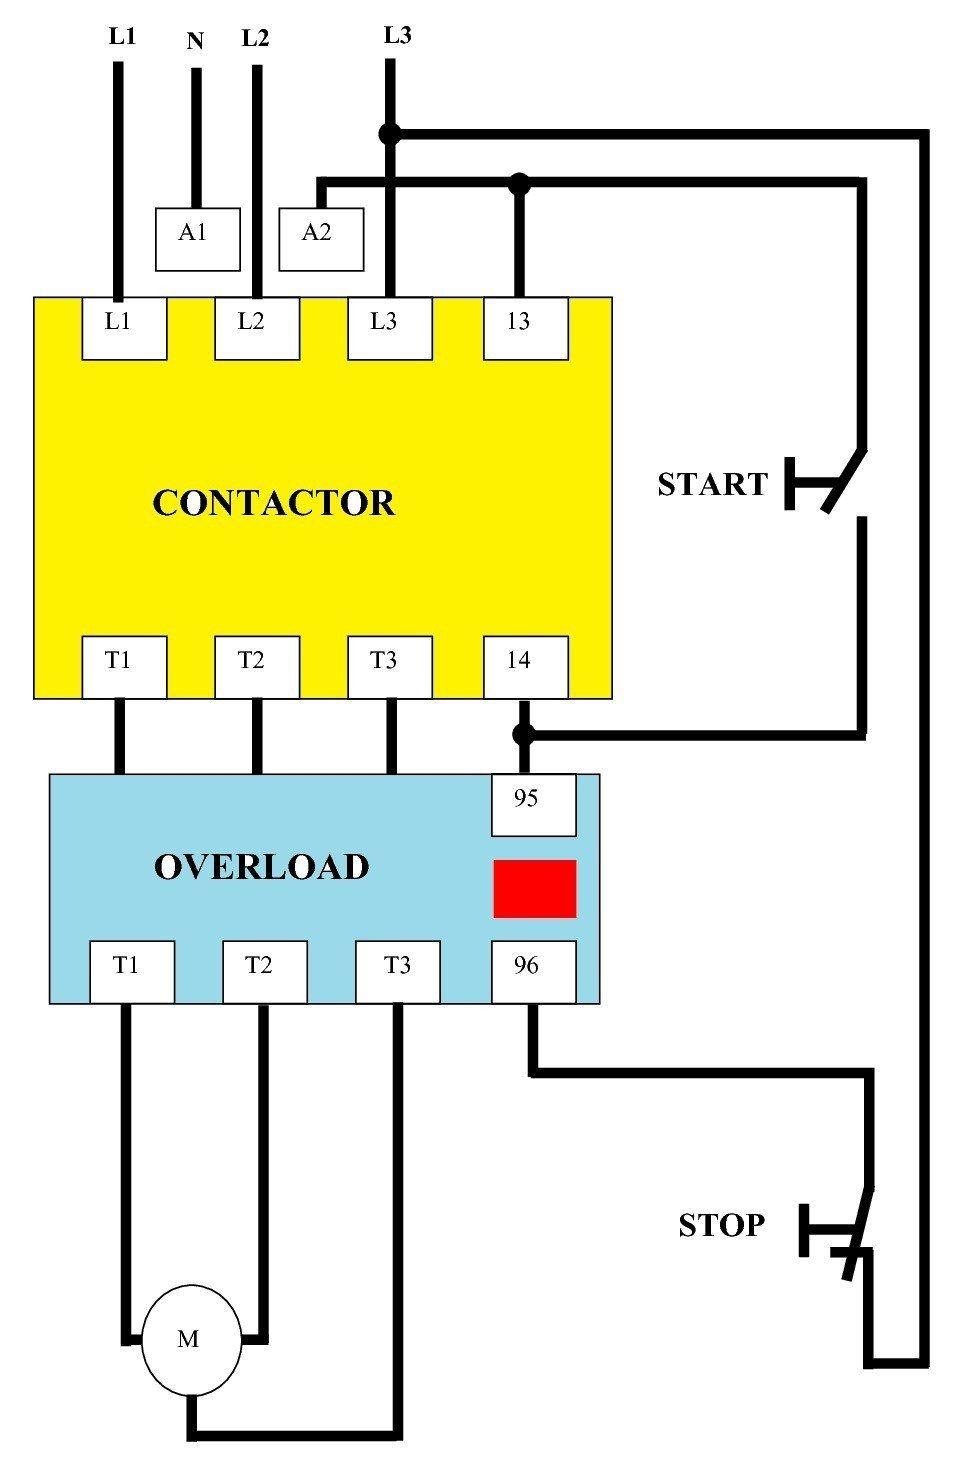 dol starter circuit diagram wiring single phase for motor star pertaining to excellent starter circuit diagram 7460 [ 968 x 1480 Pixel ]